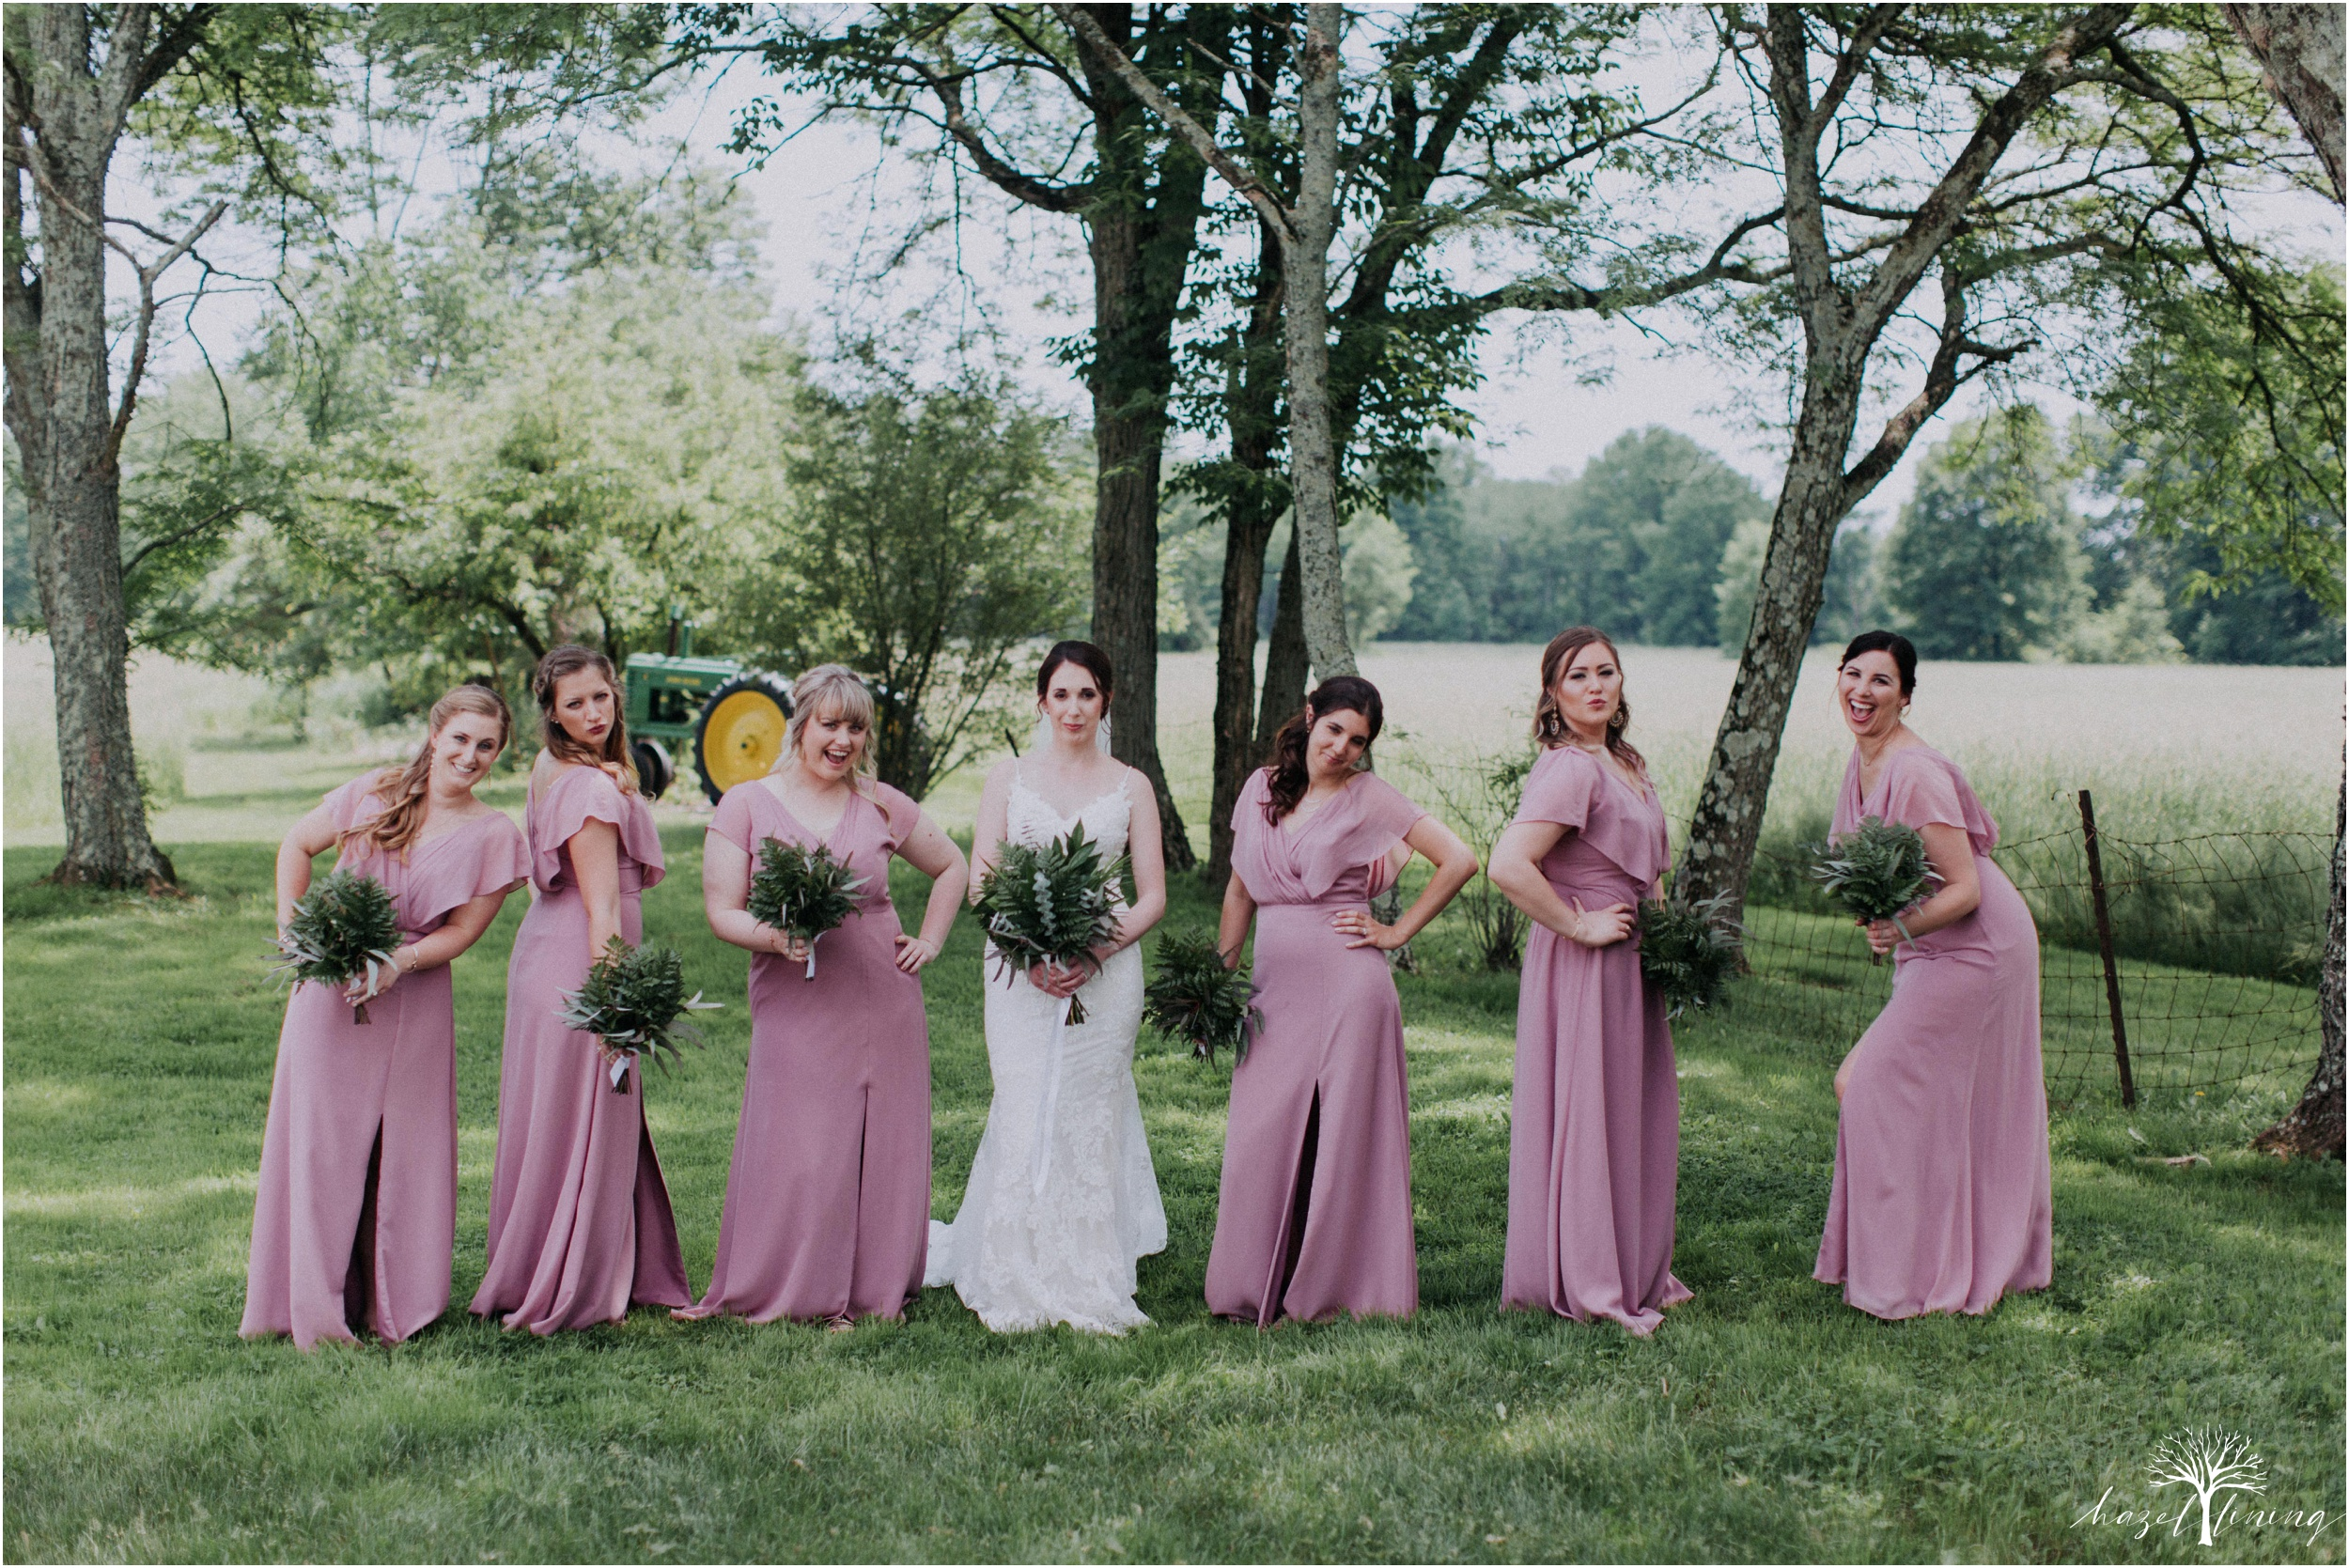 hazel-lining-travel-wedding-elopement-photography-lisa-landon-shoemaker-the-farm-bakery-and-events-bucks-county-quakertown-pennsylvania-summer-country-outdoor-farm-wedding_0029.jpg